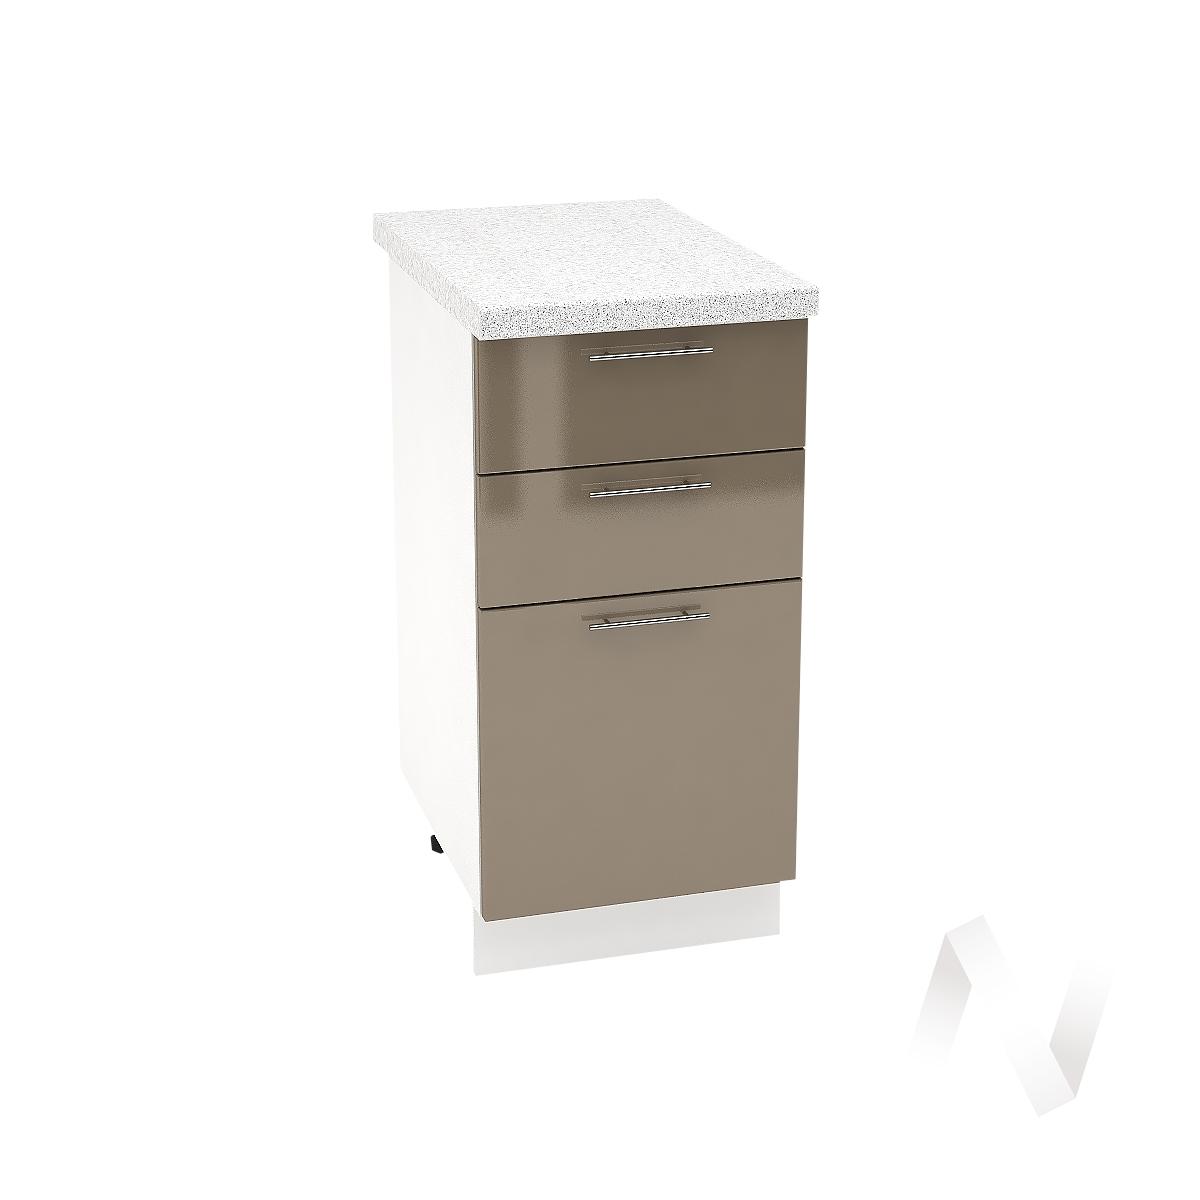 "Кухня ""Валерия-М"": Шкаф нижний с 3-мя ящиками 400, ШН3Я 400 (Капучино глянец/корпус белый)"